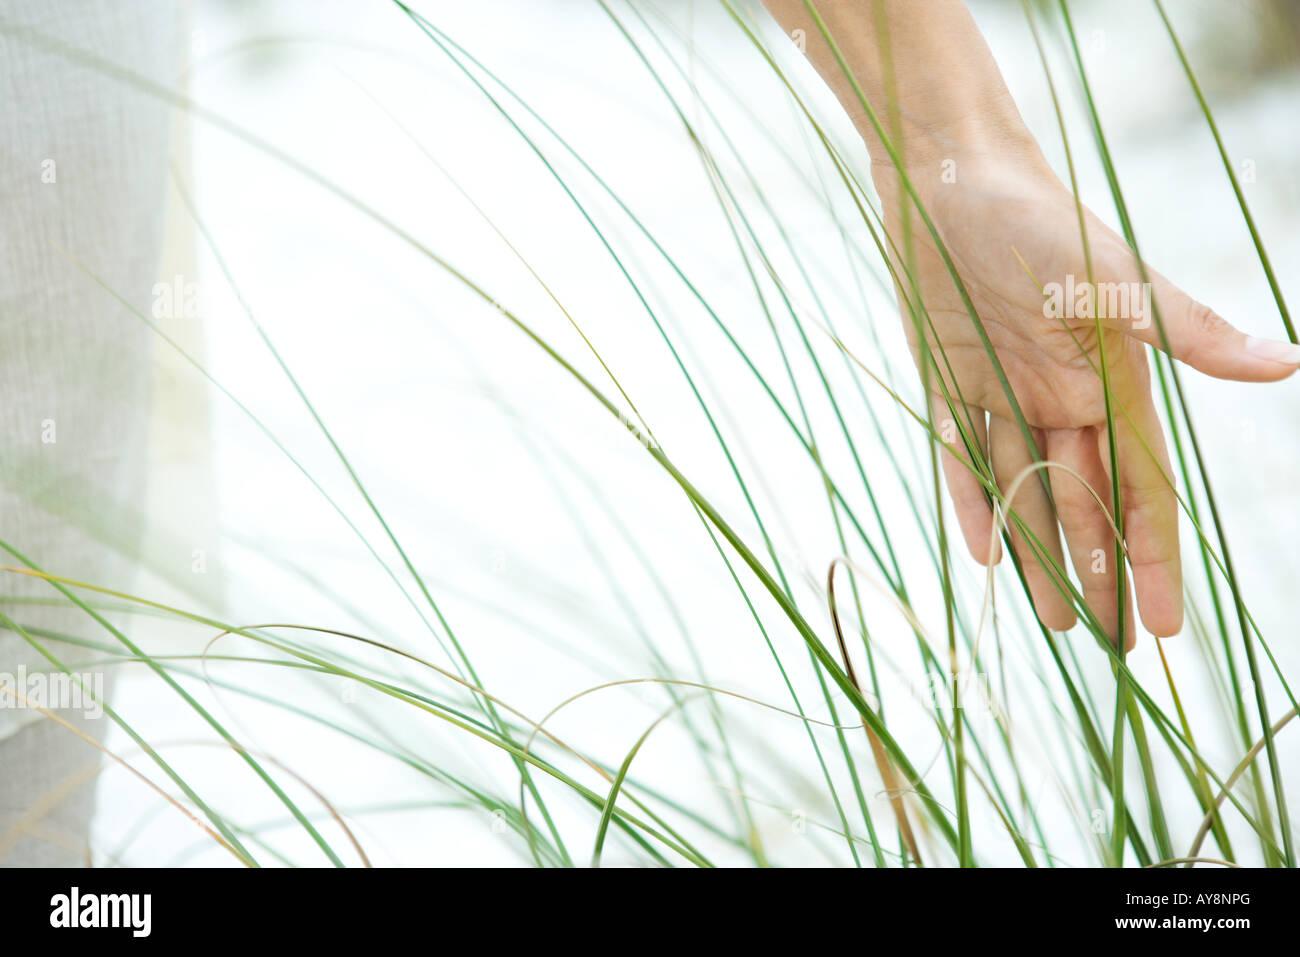 Hand touching dune grass, close-up - Stock Image